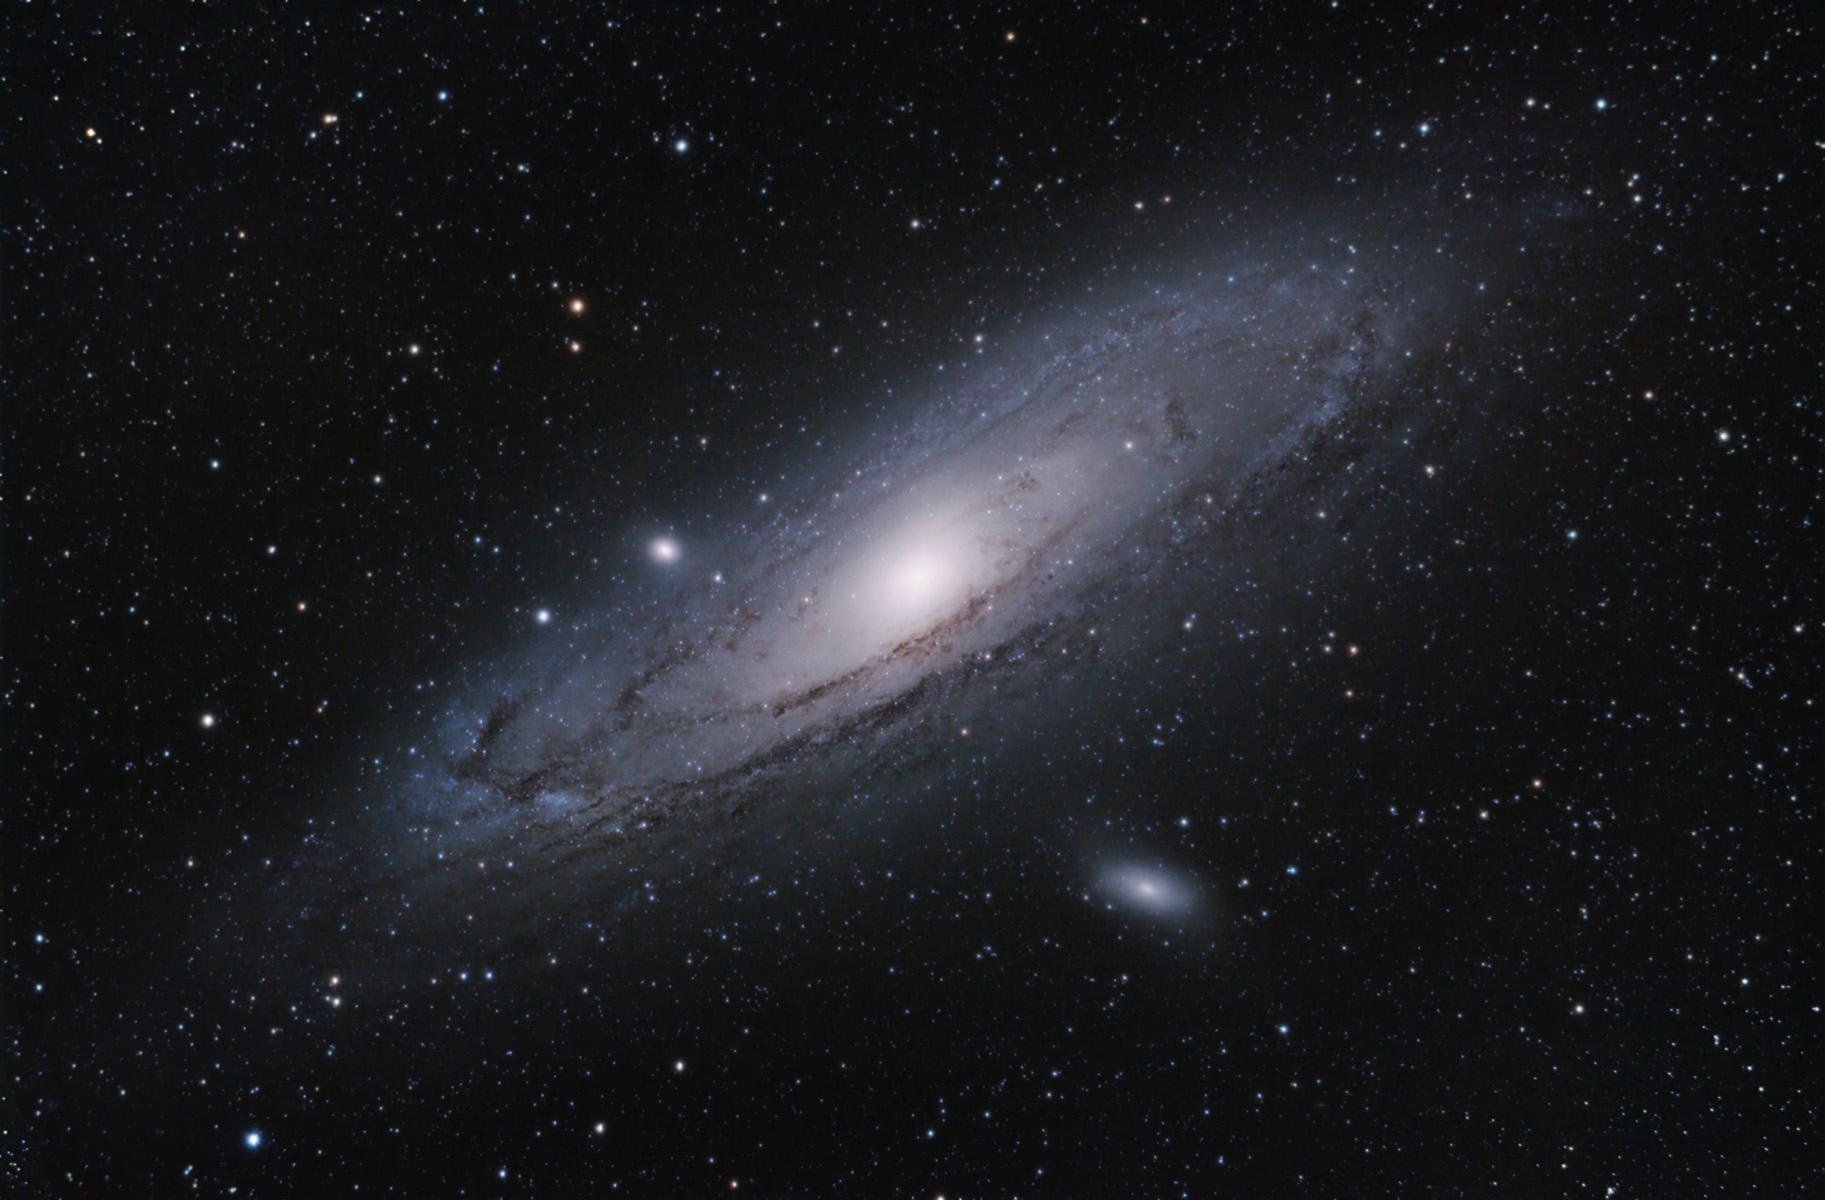 andromeda galaxy through telescope - HD1825×1200